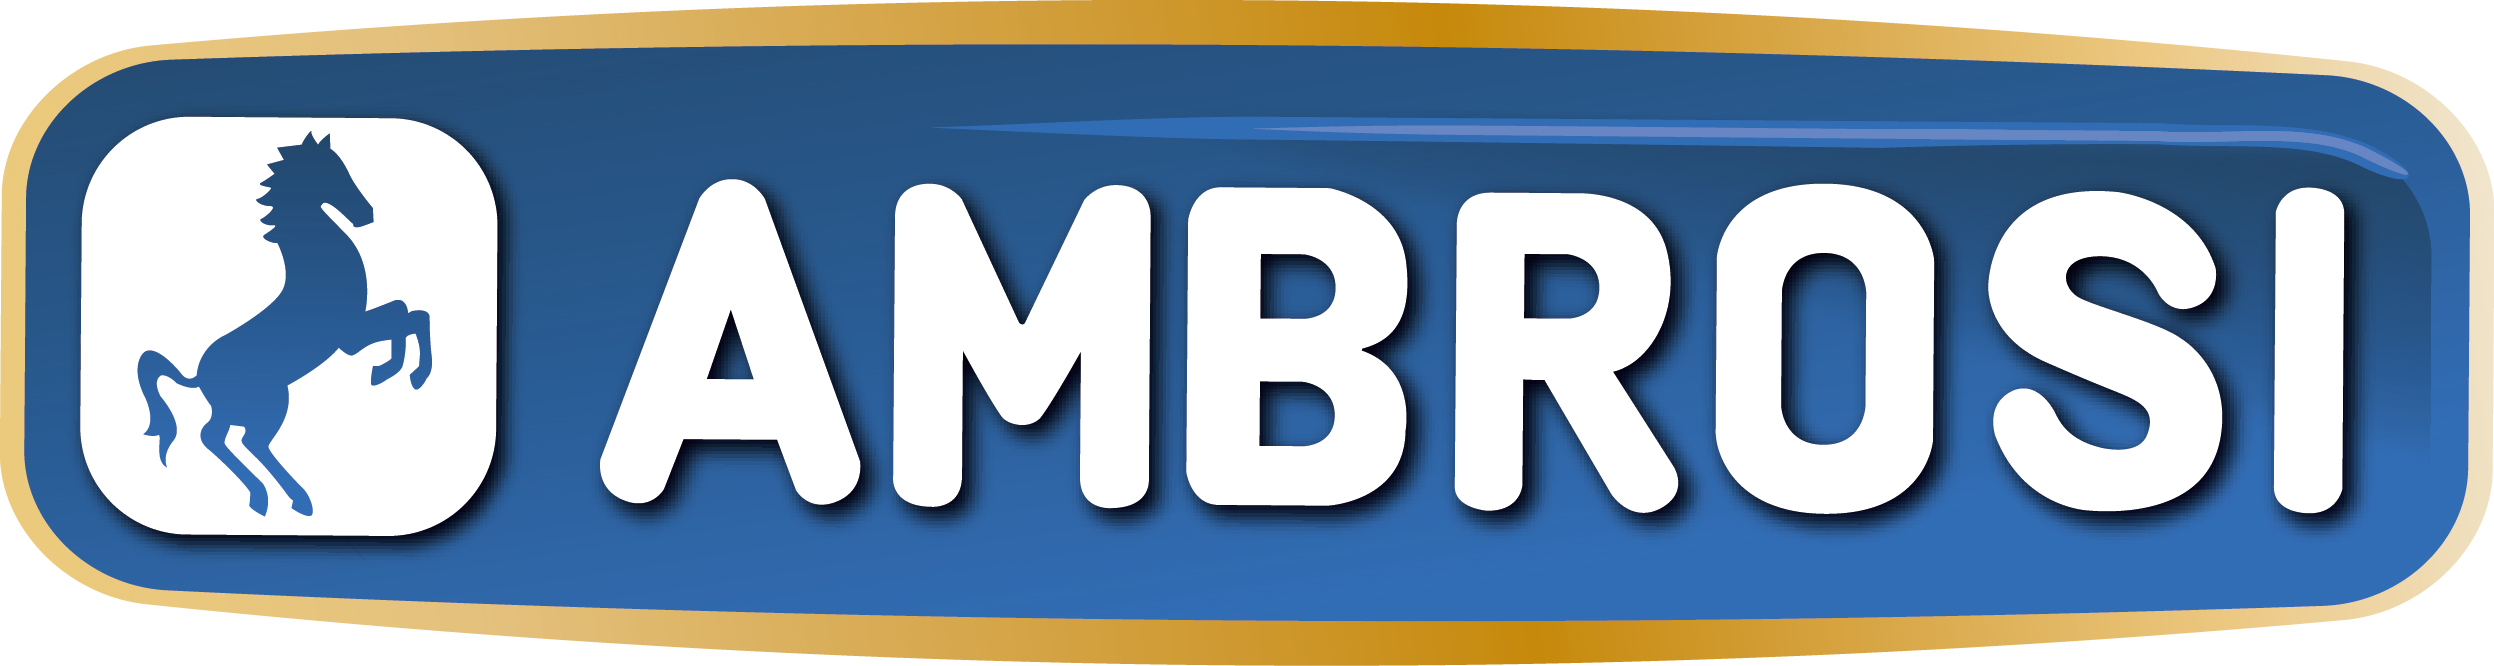 ambrosi-logo.jpg